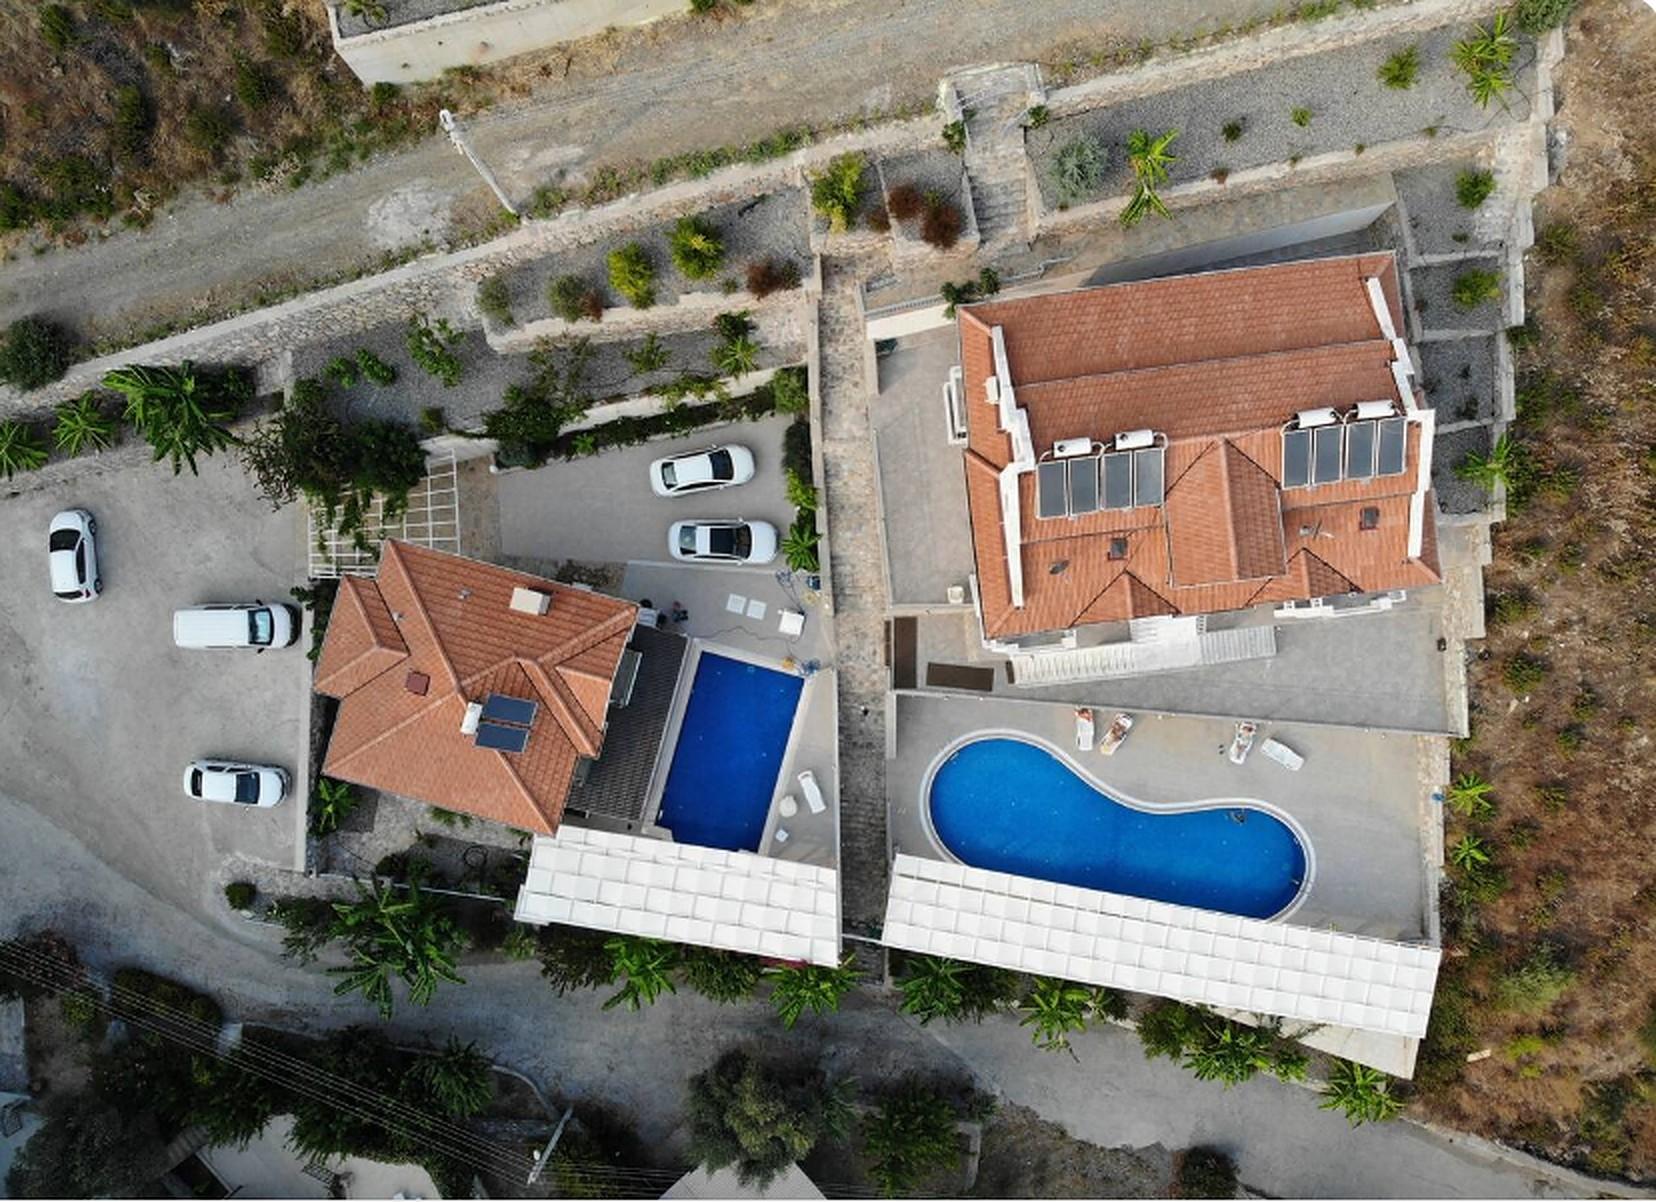 Ferienwohnung Begonville Apartment Klein (2654617), Sarıgerme, , Ägäisregion, Türkei, Bild 1